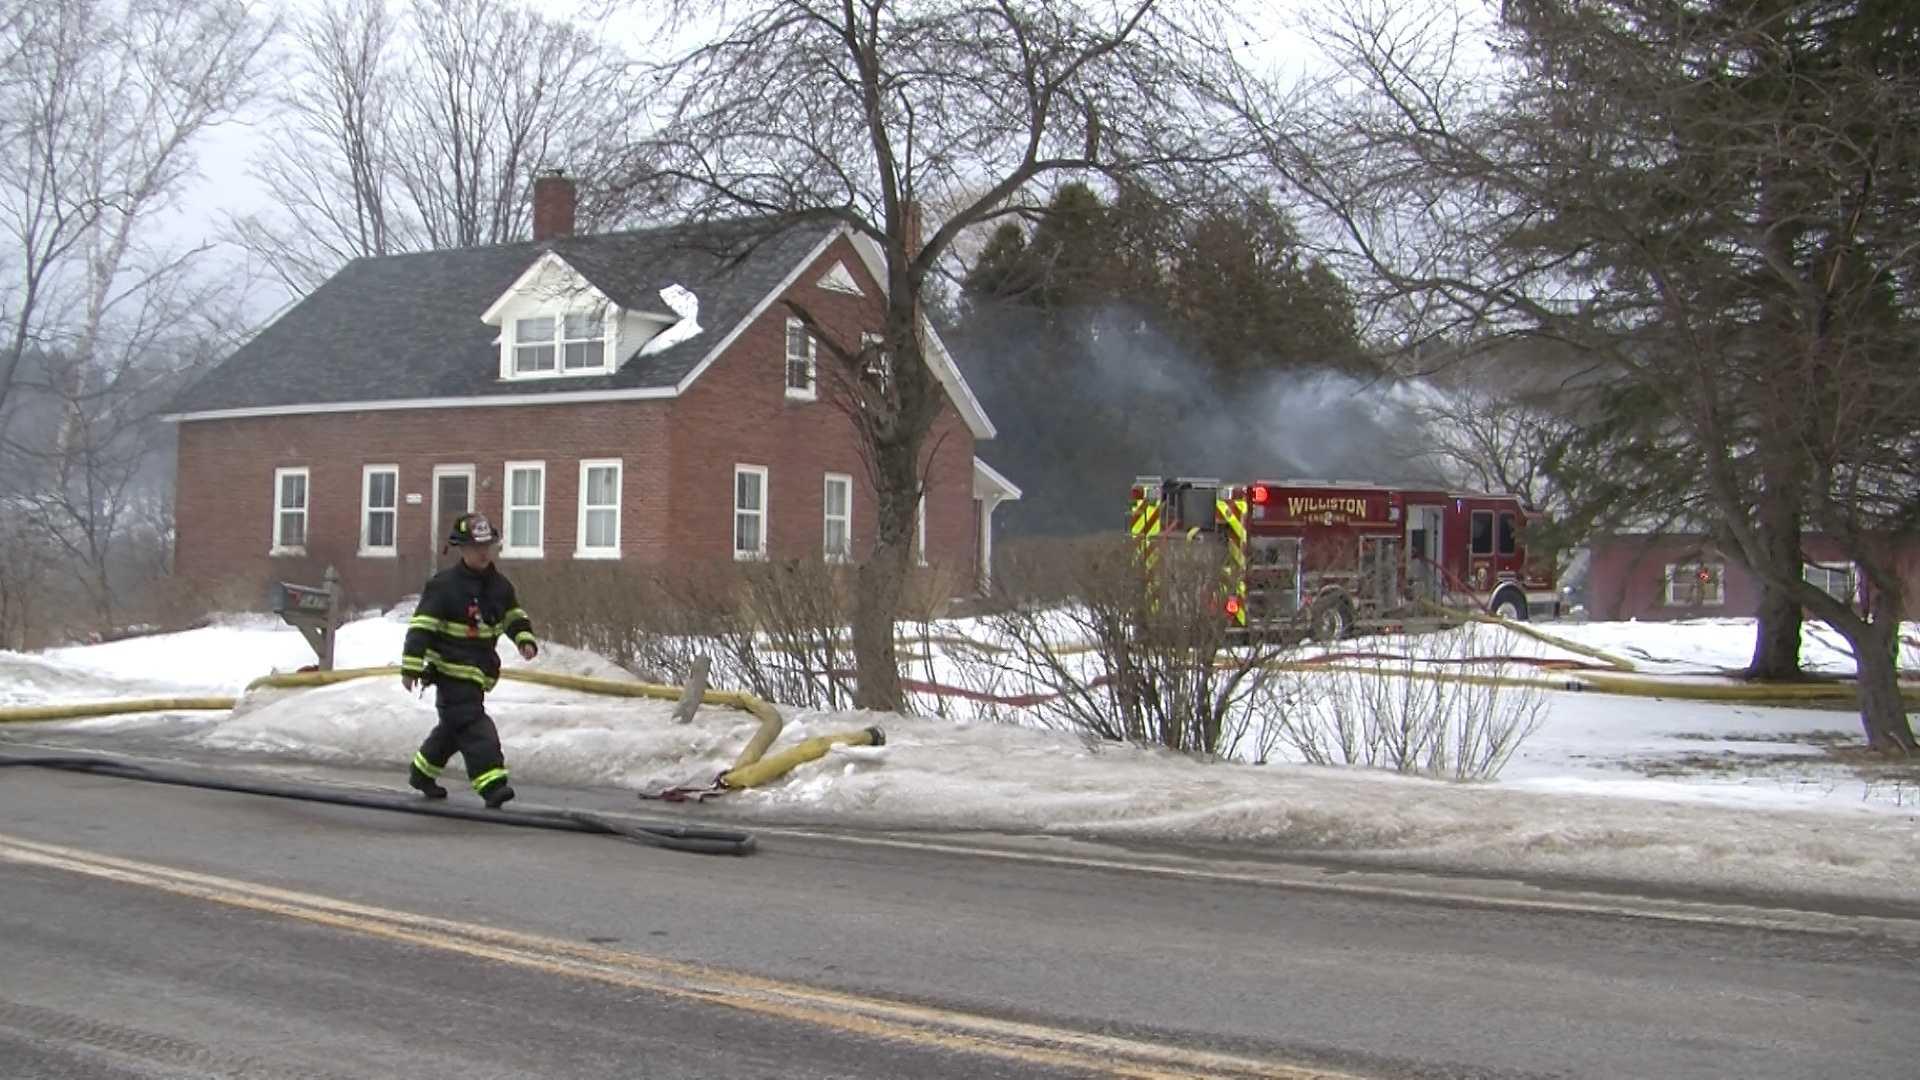 3-19-14 Crews battle barn fire, road closes - img